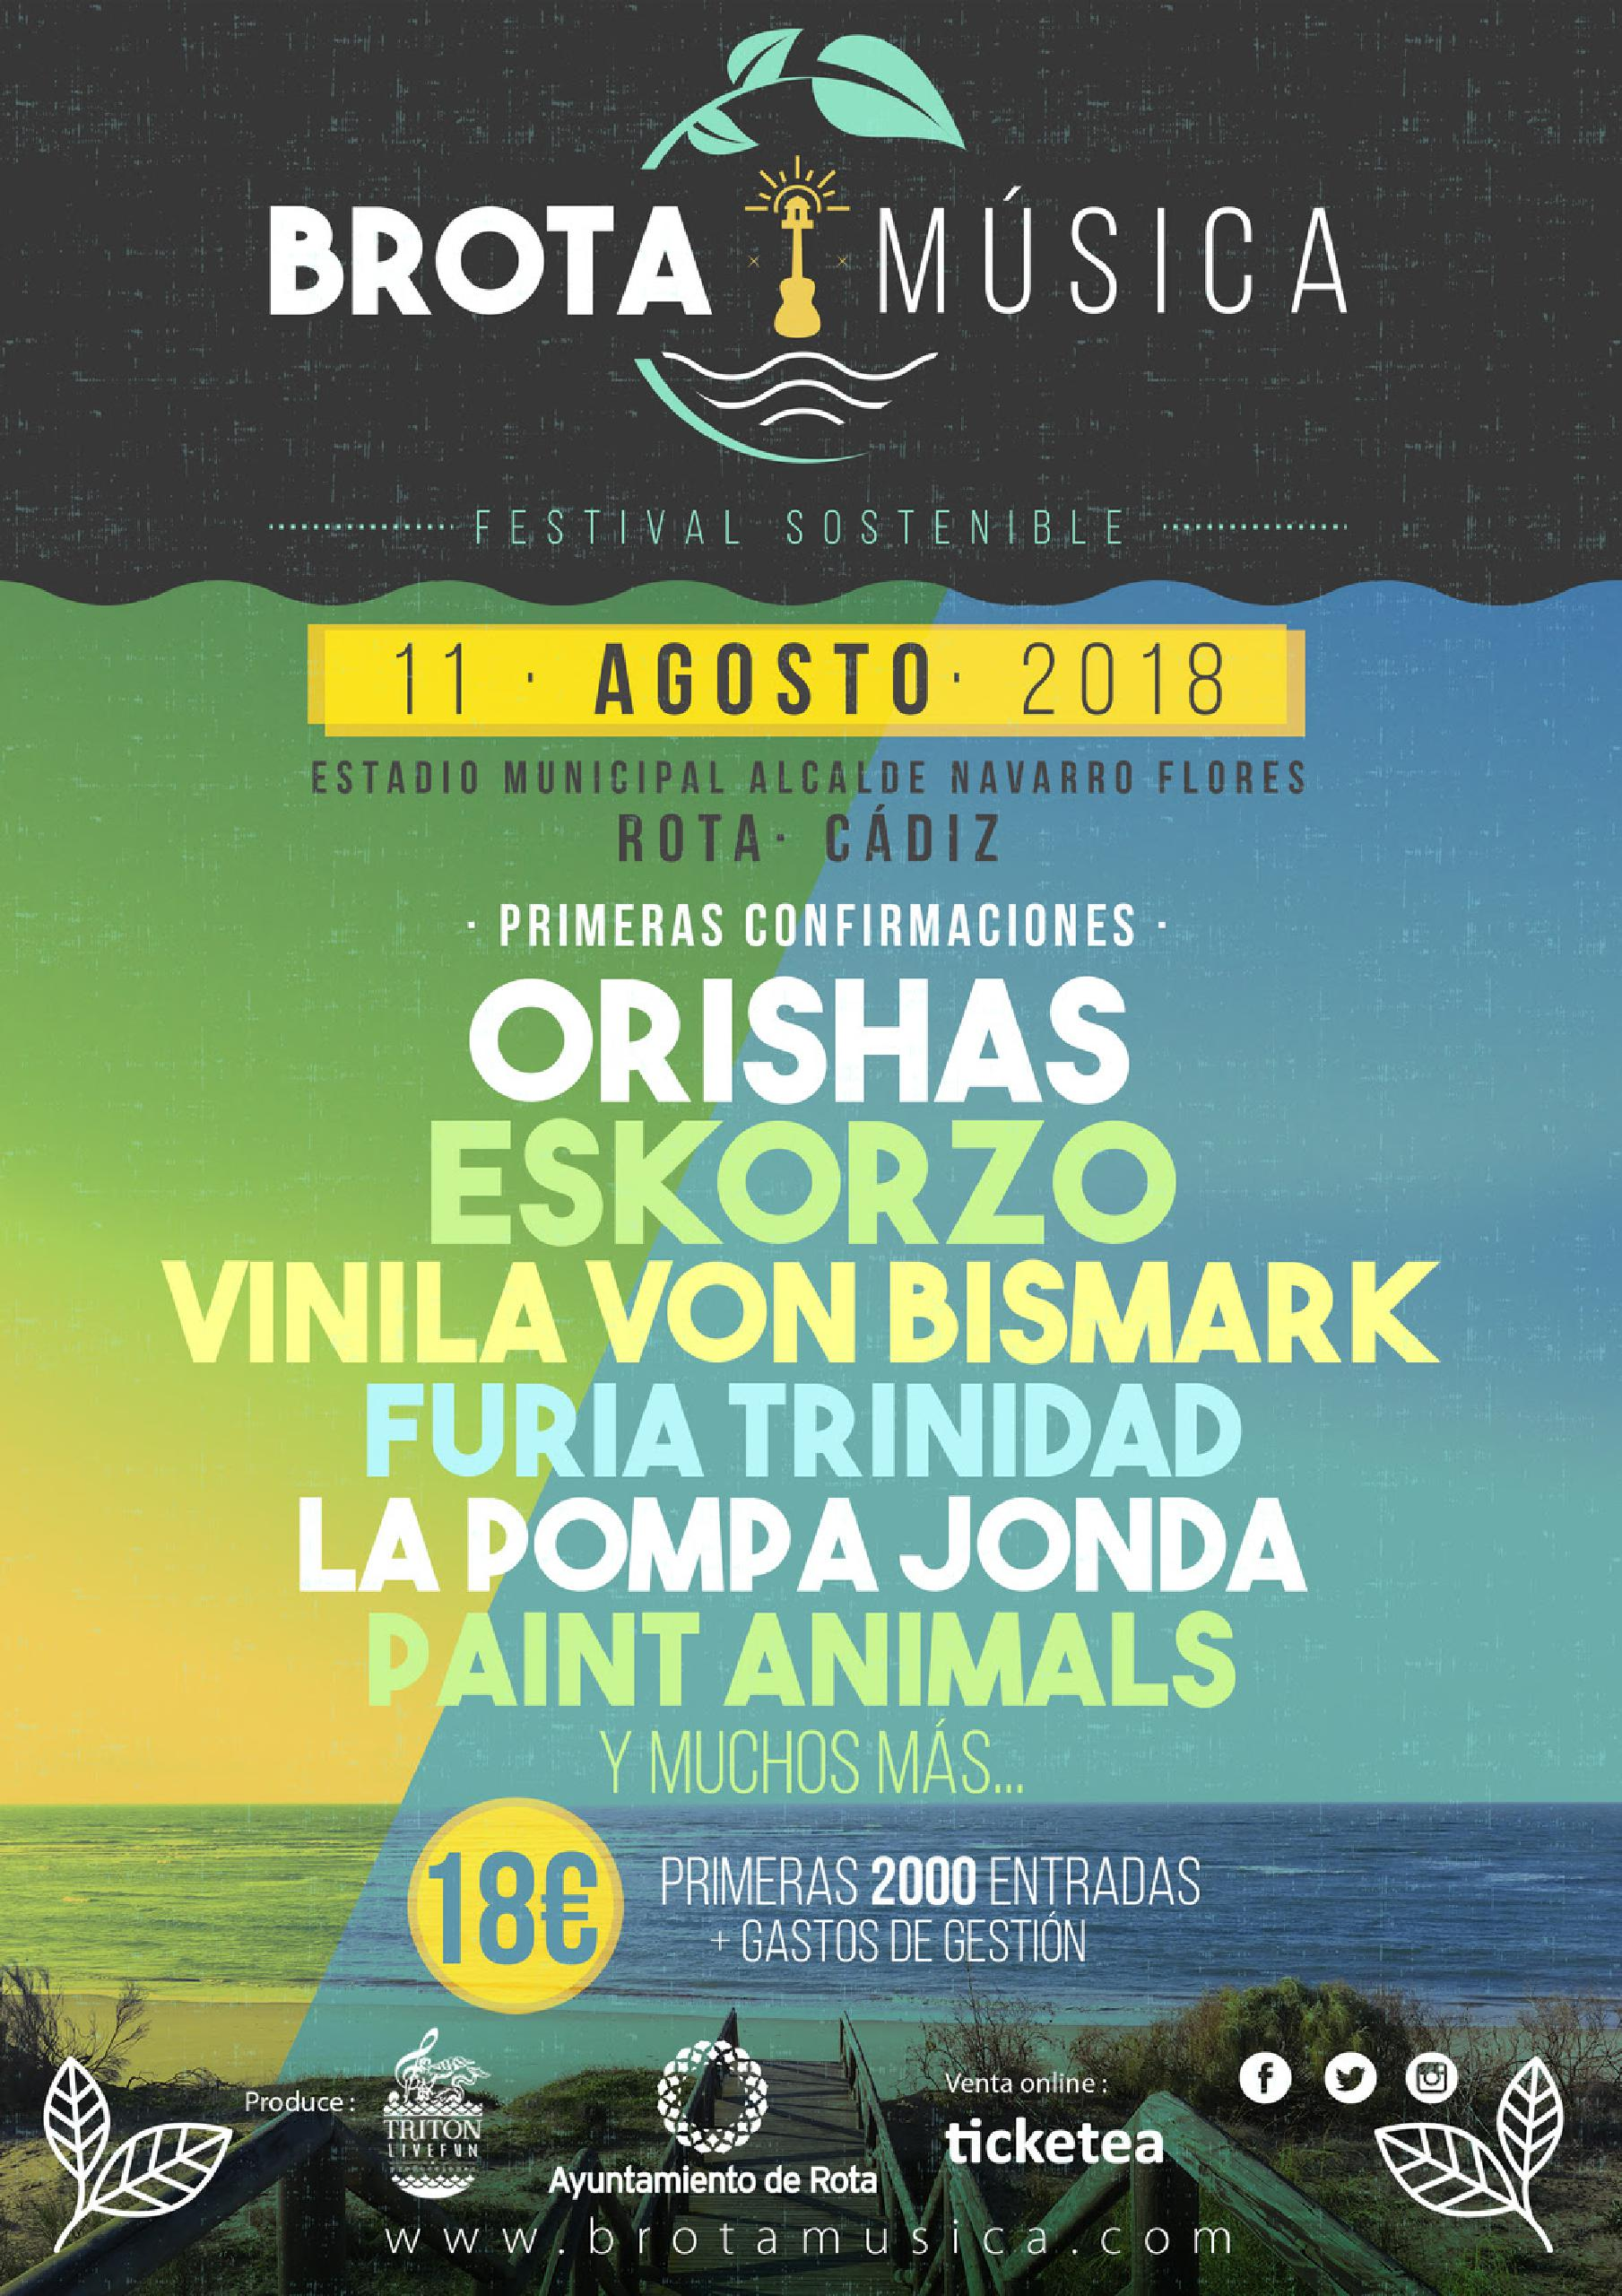 Cartel primeras confirmaciones festival Brota Música 2018